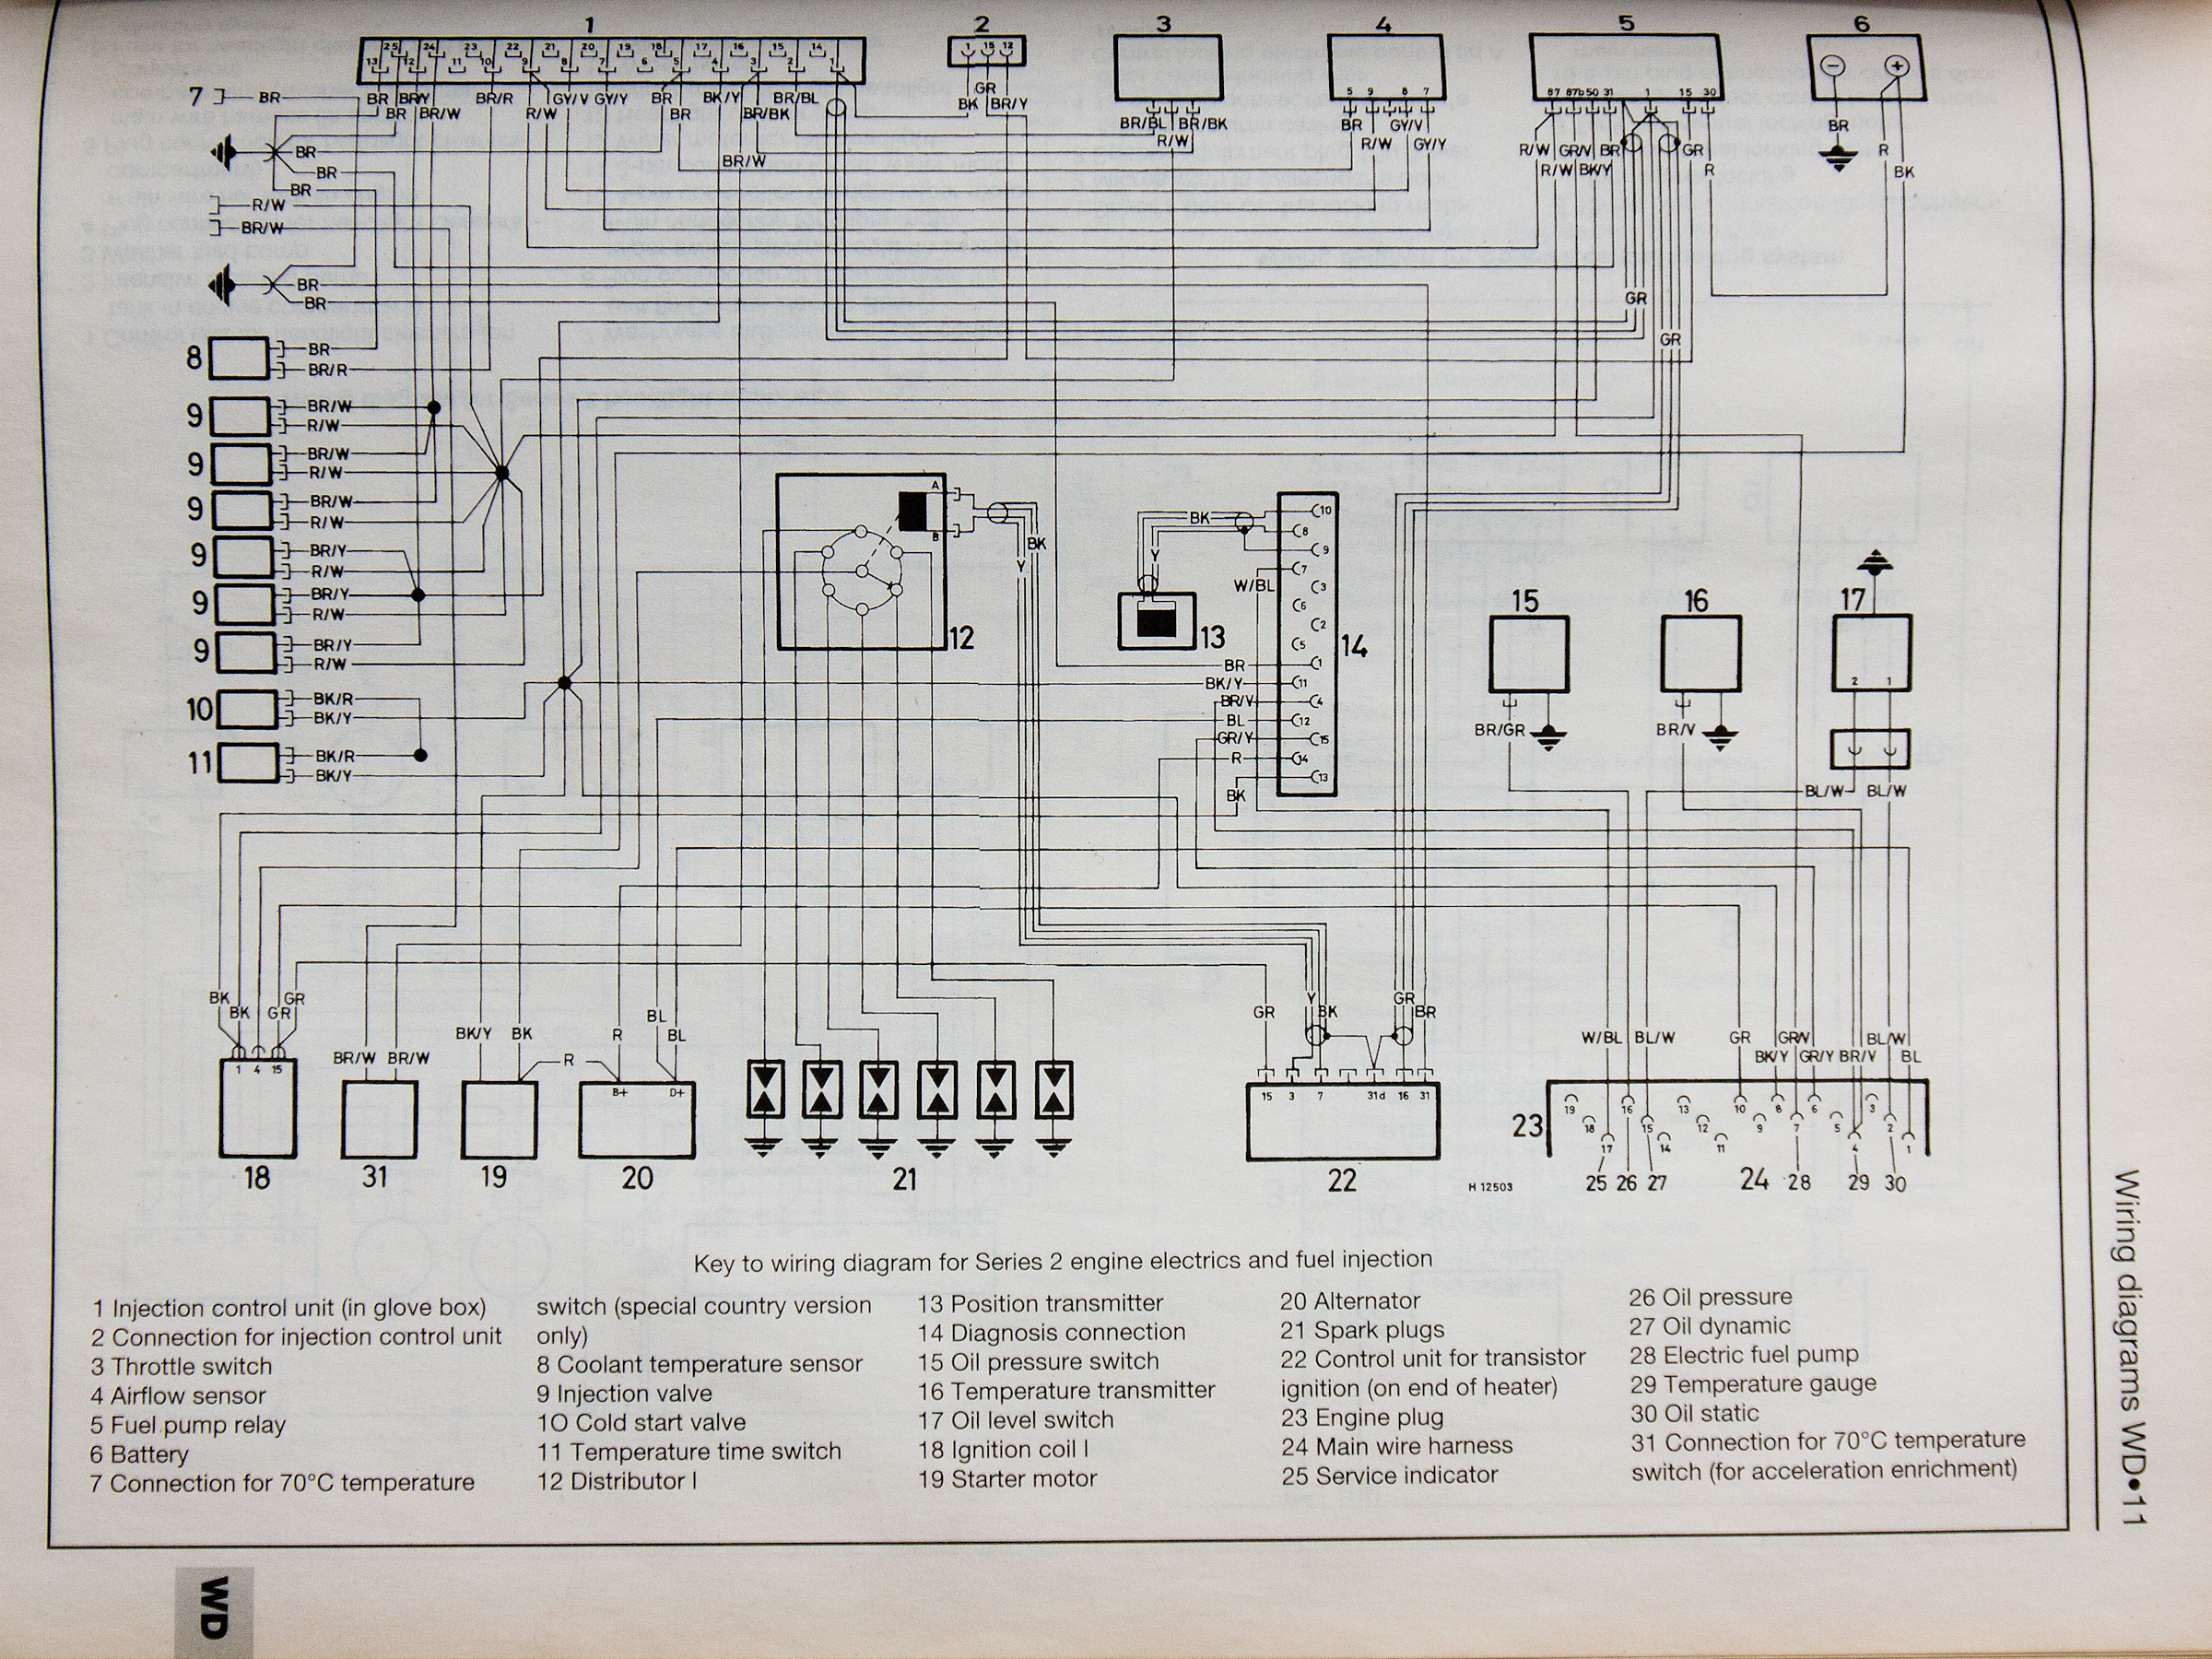 Outstanding Bmw 318I Wiring Diagram Schematic Diagram Wiring Cloud Inklaidewilluminateatxorg